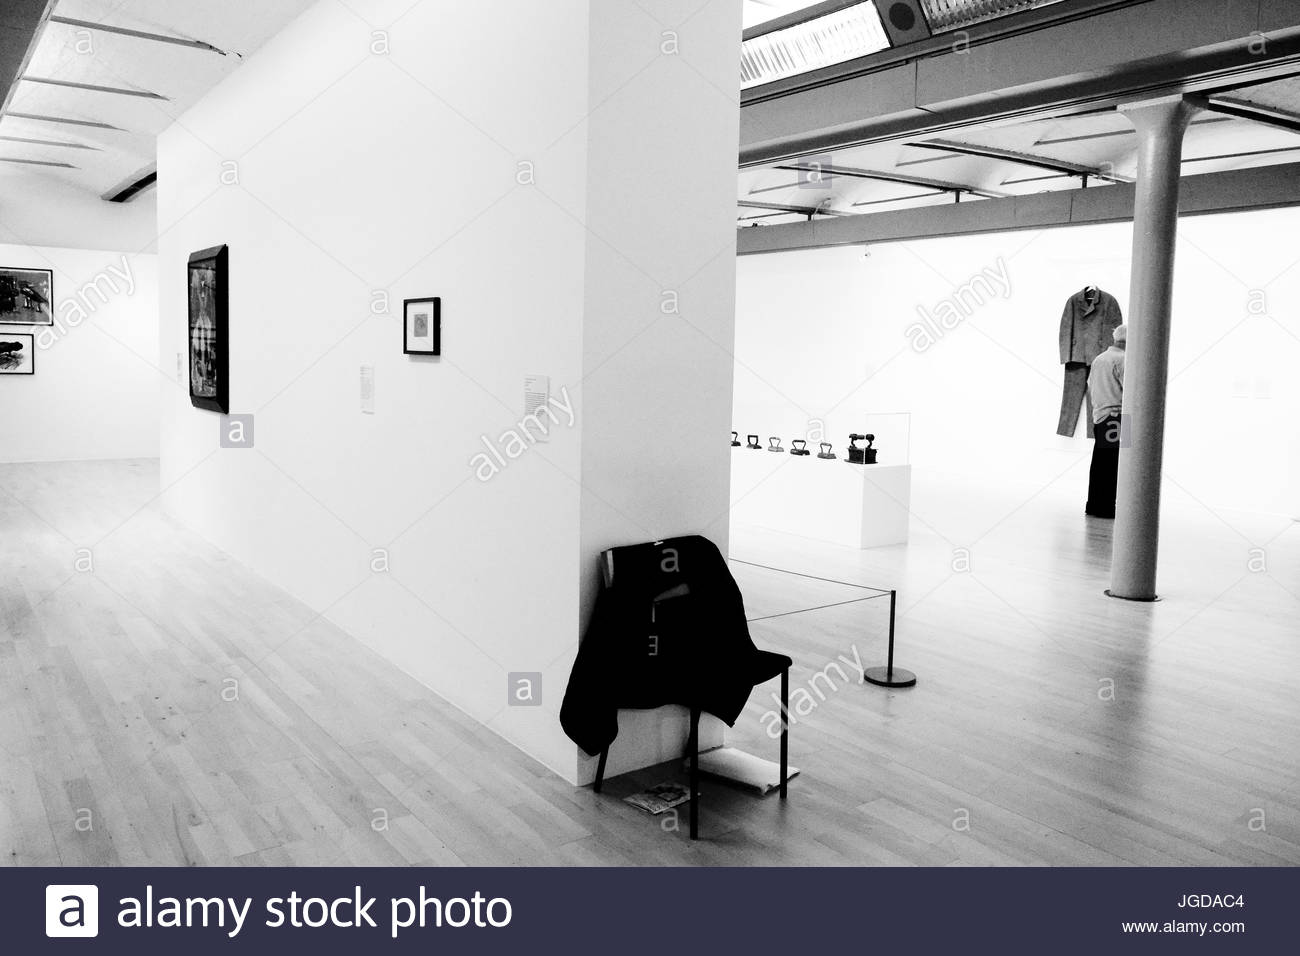 Gallery scene, Liverpool, UK. - Stock Image